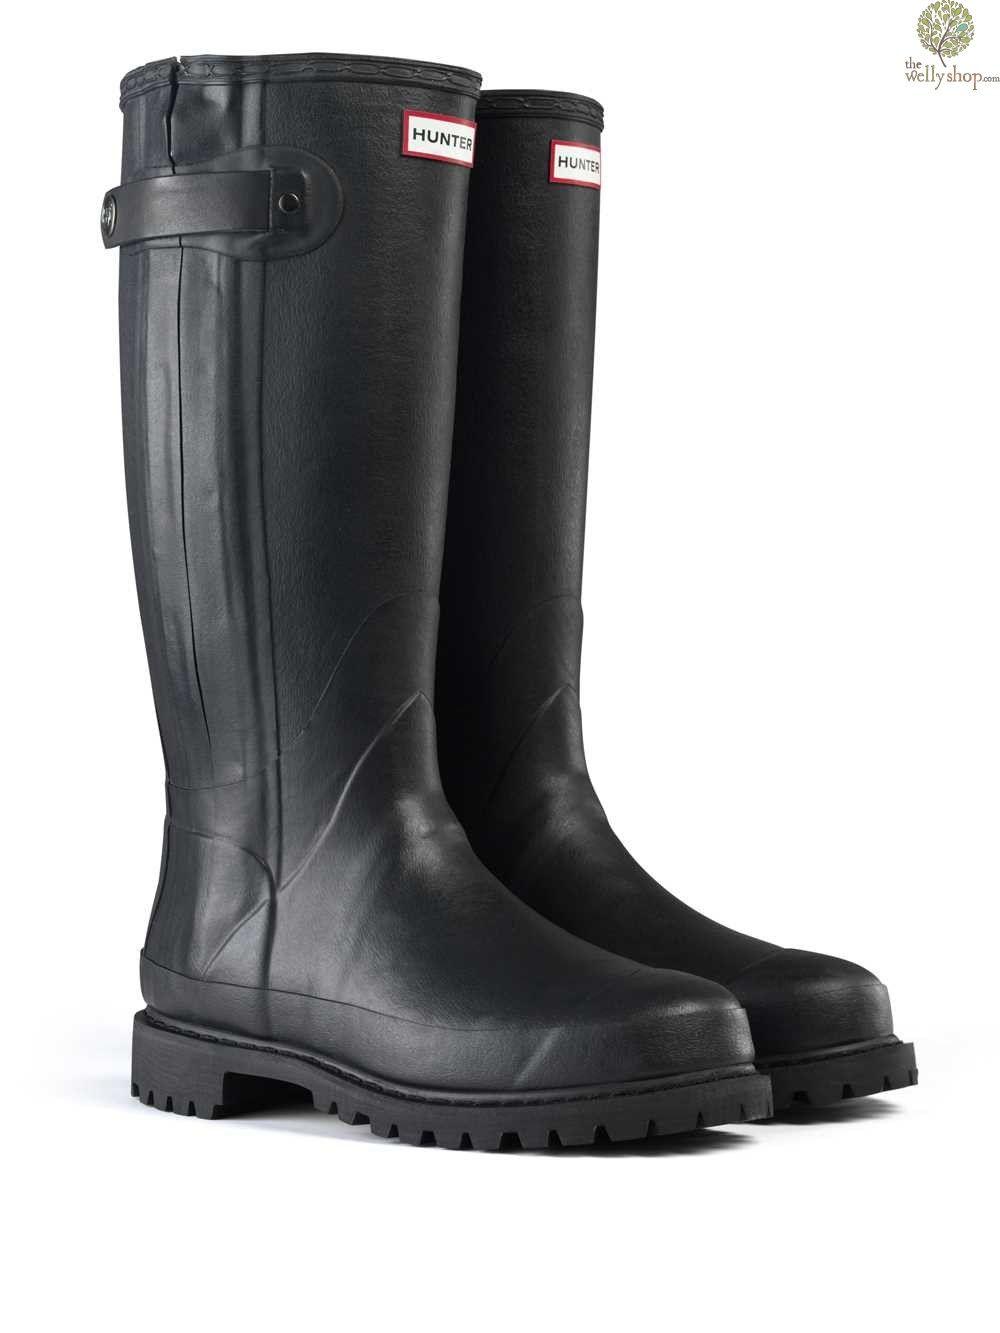 Hunter Balmoral Sovereign Rubber Boots